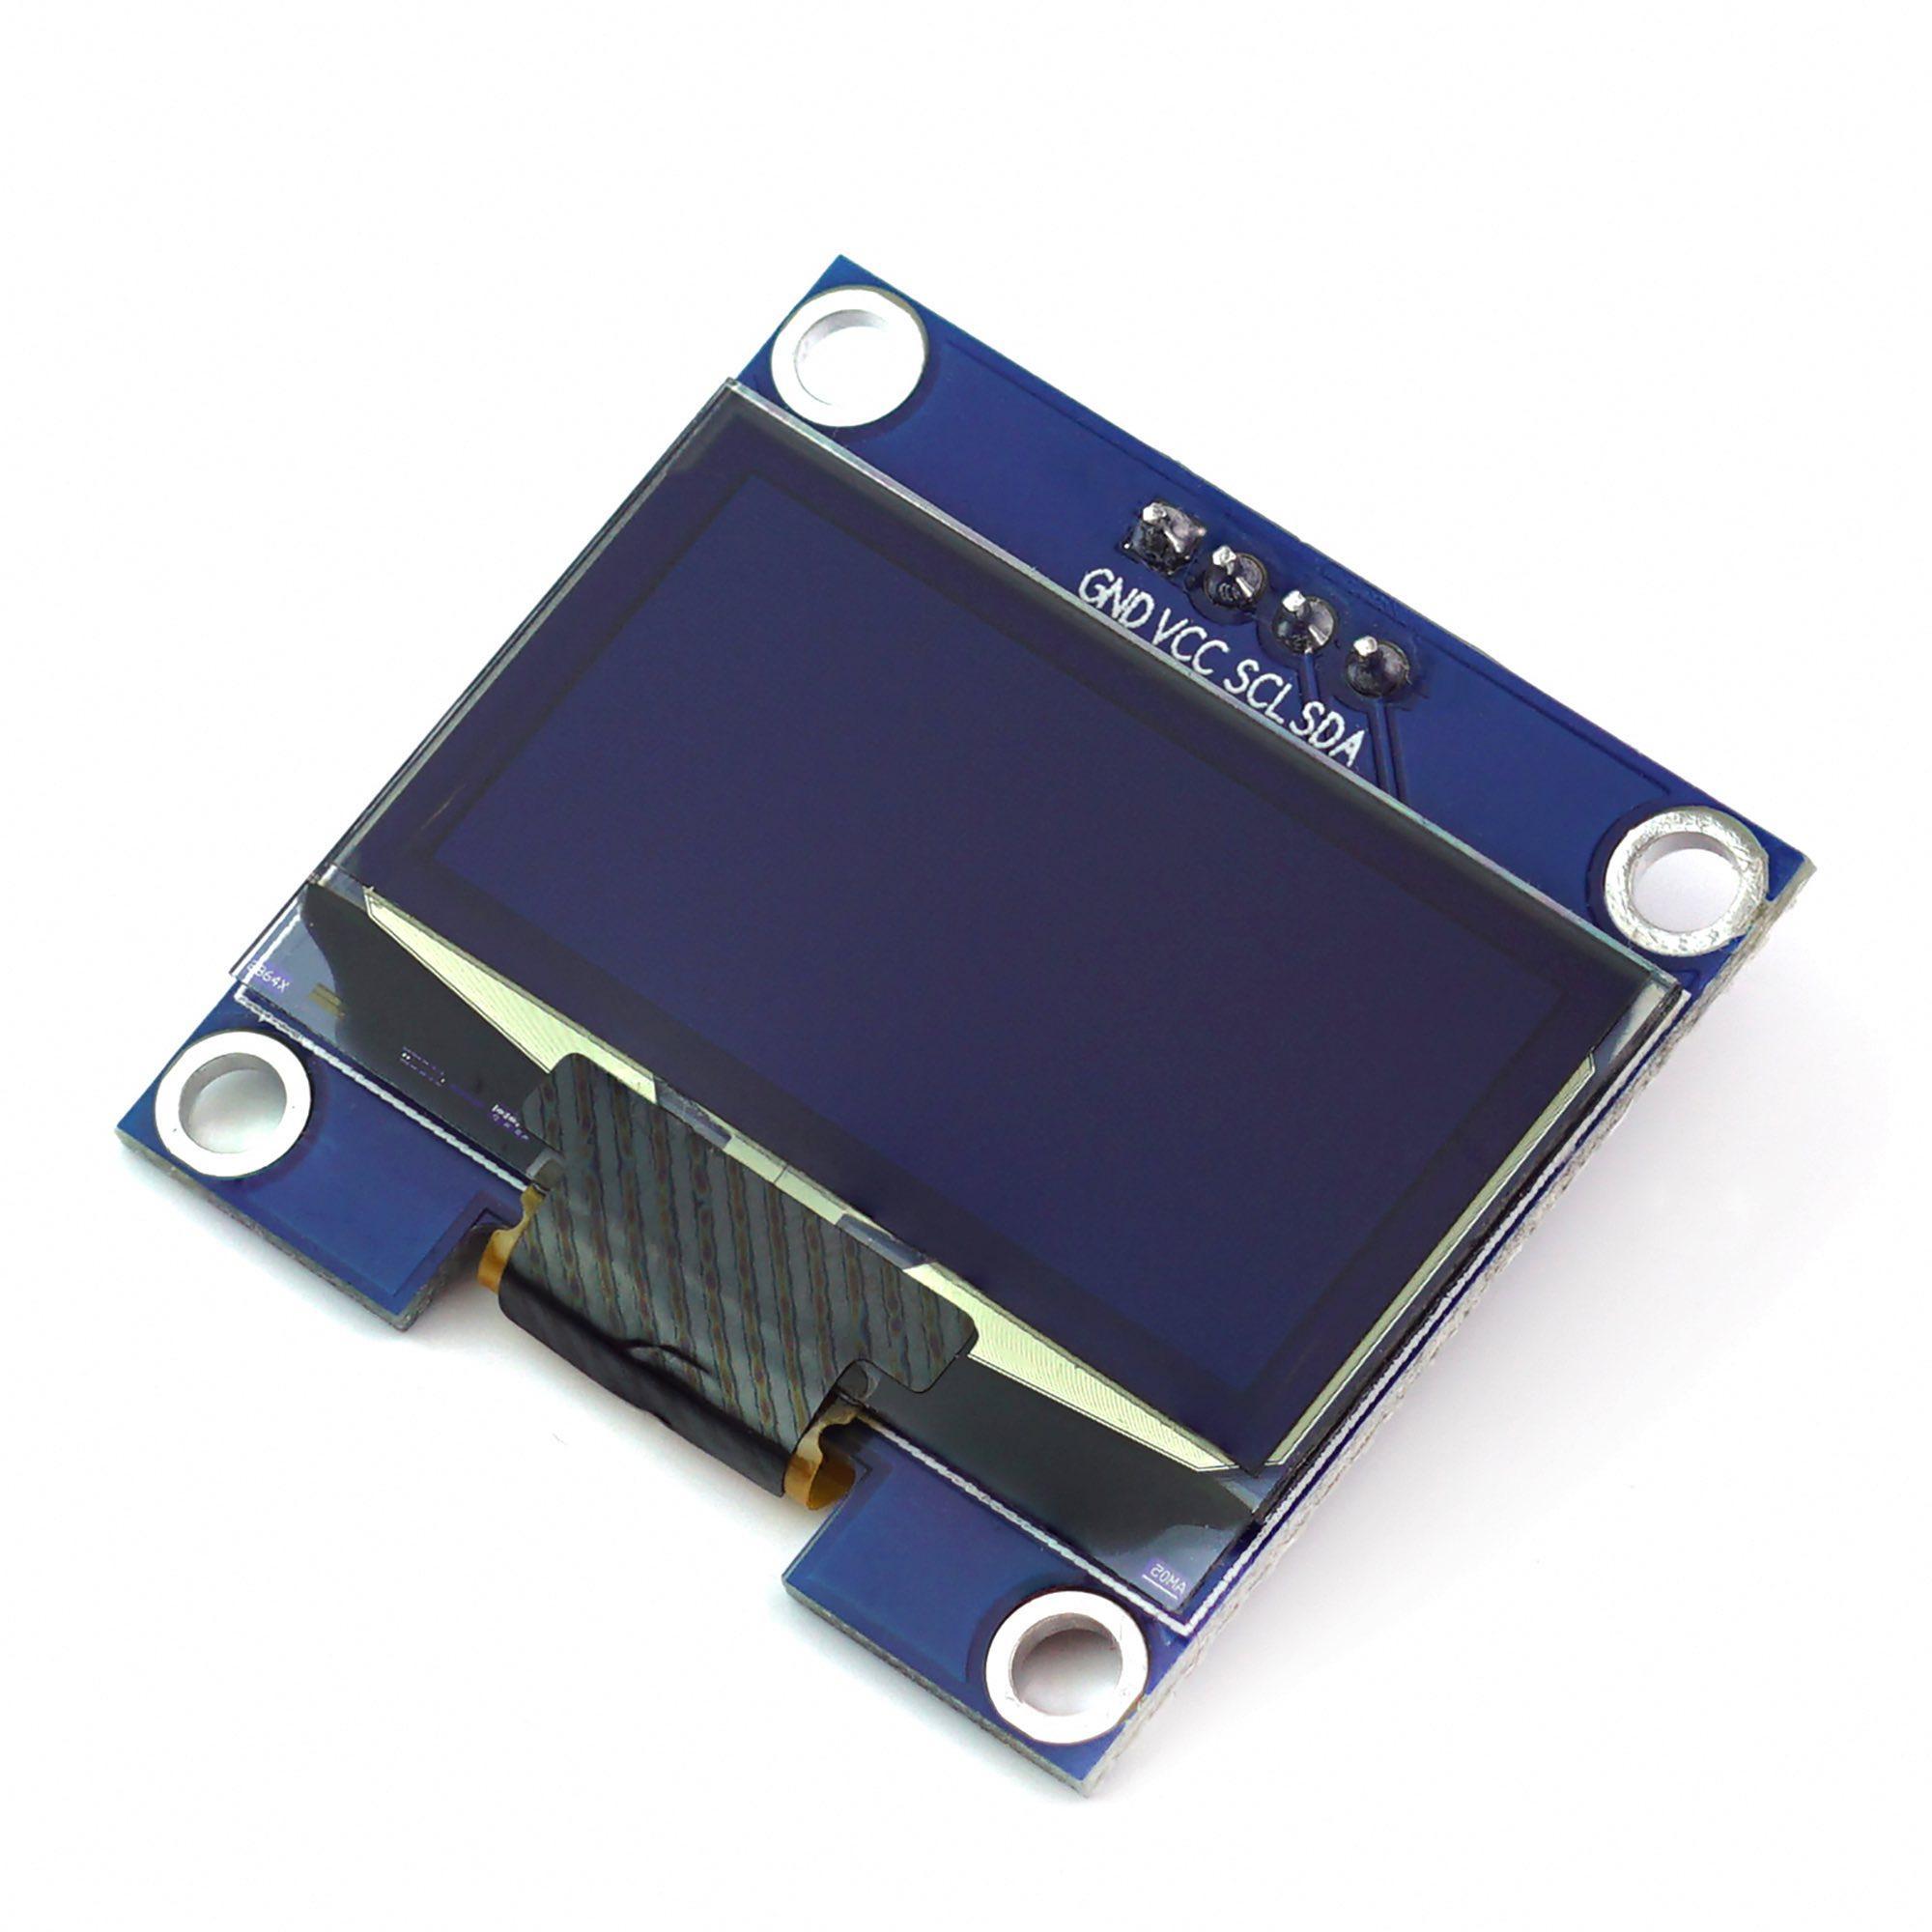 "Anzeige 1.3"" Grafik OLED 128x64 I2C SH1106 blau"